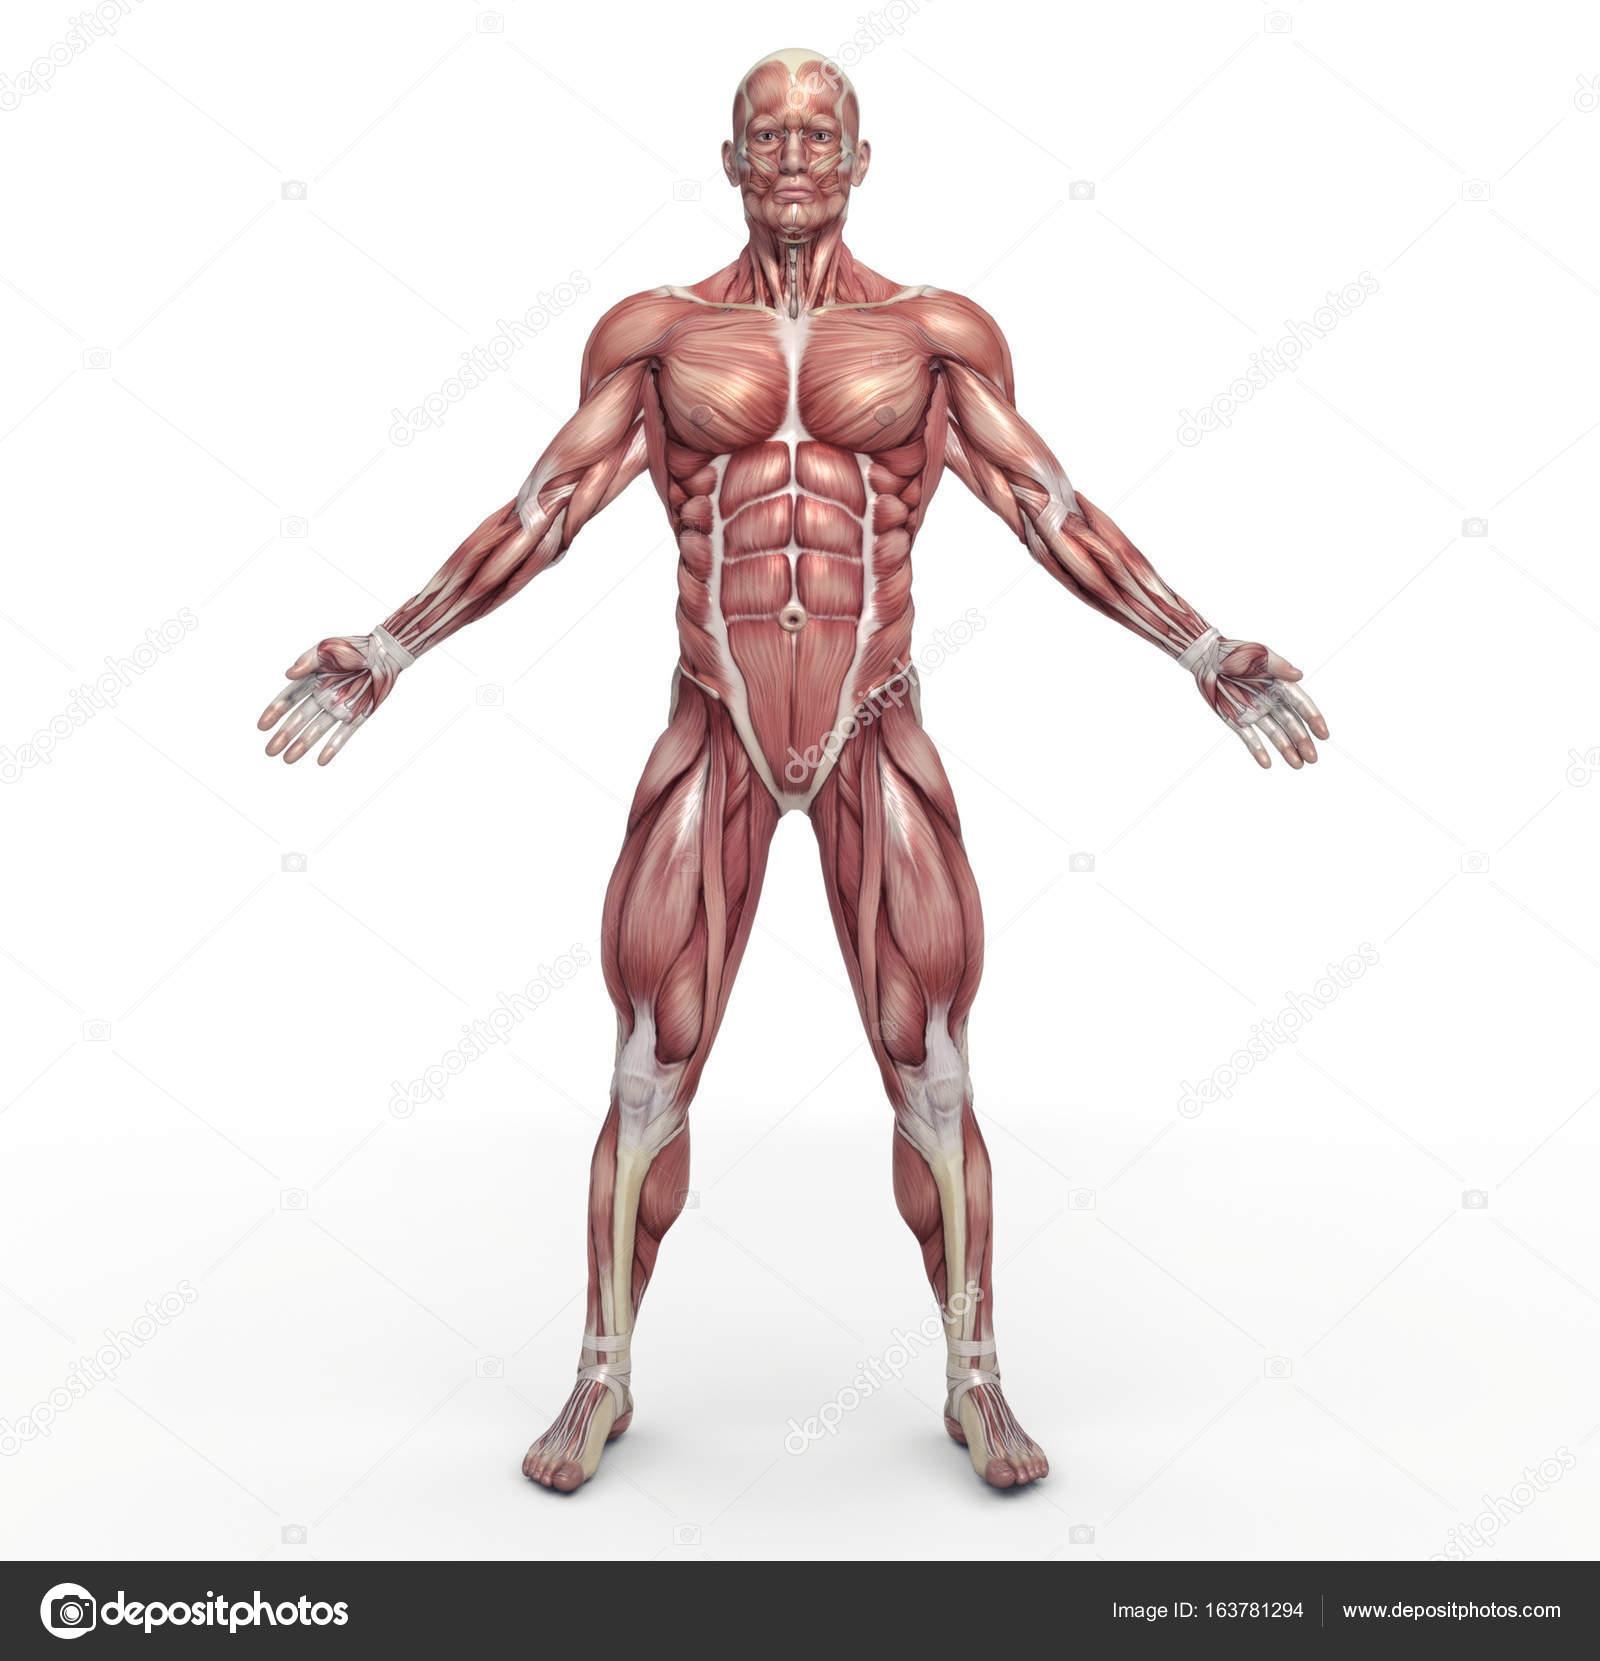 sistema muscular masculino — Foto de stock © orlaimagen #163781294